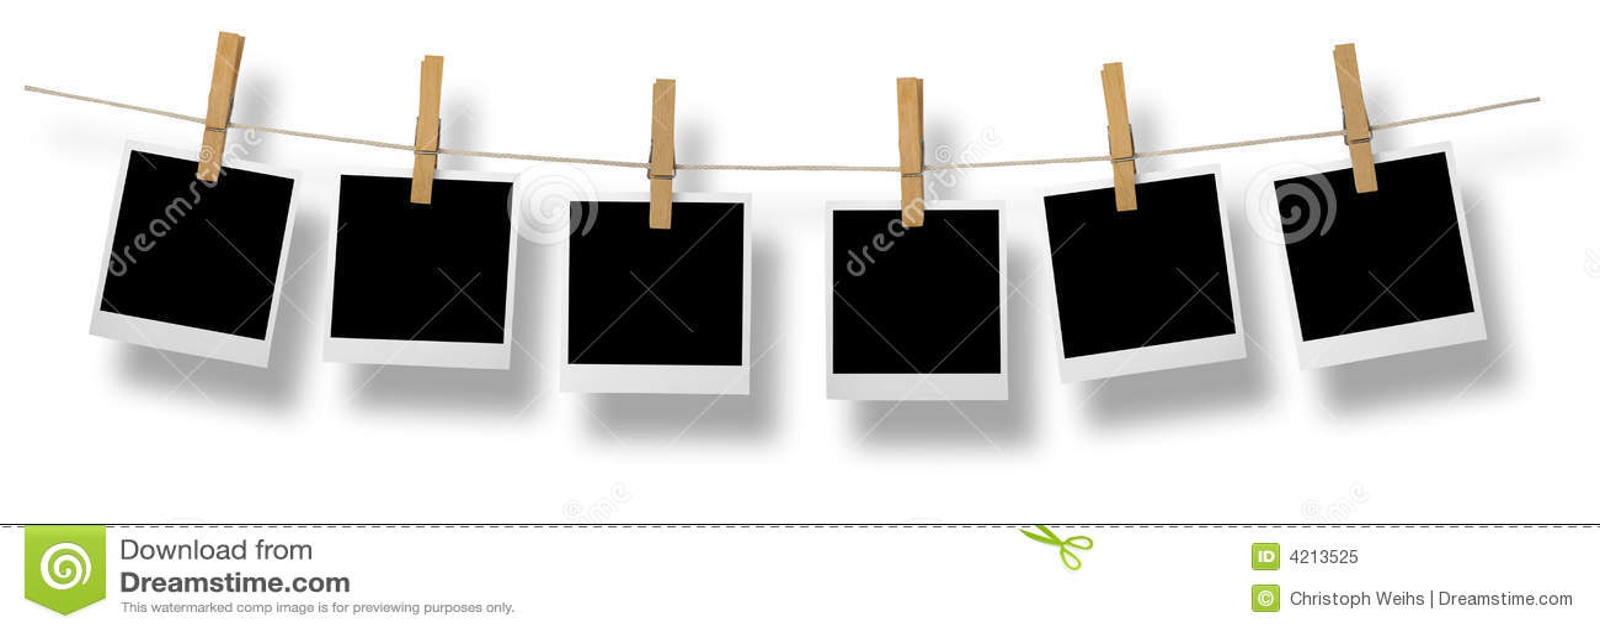 Instant Camera Frames stock photo. Image of horizontal - 35761936